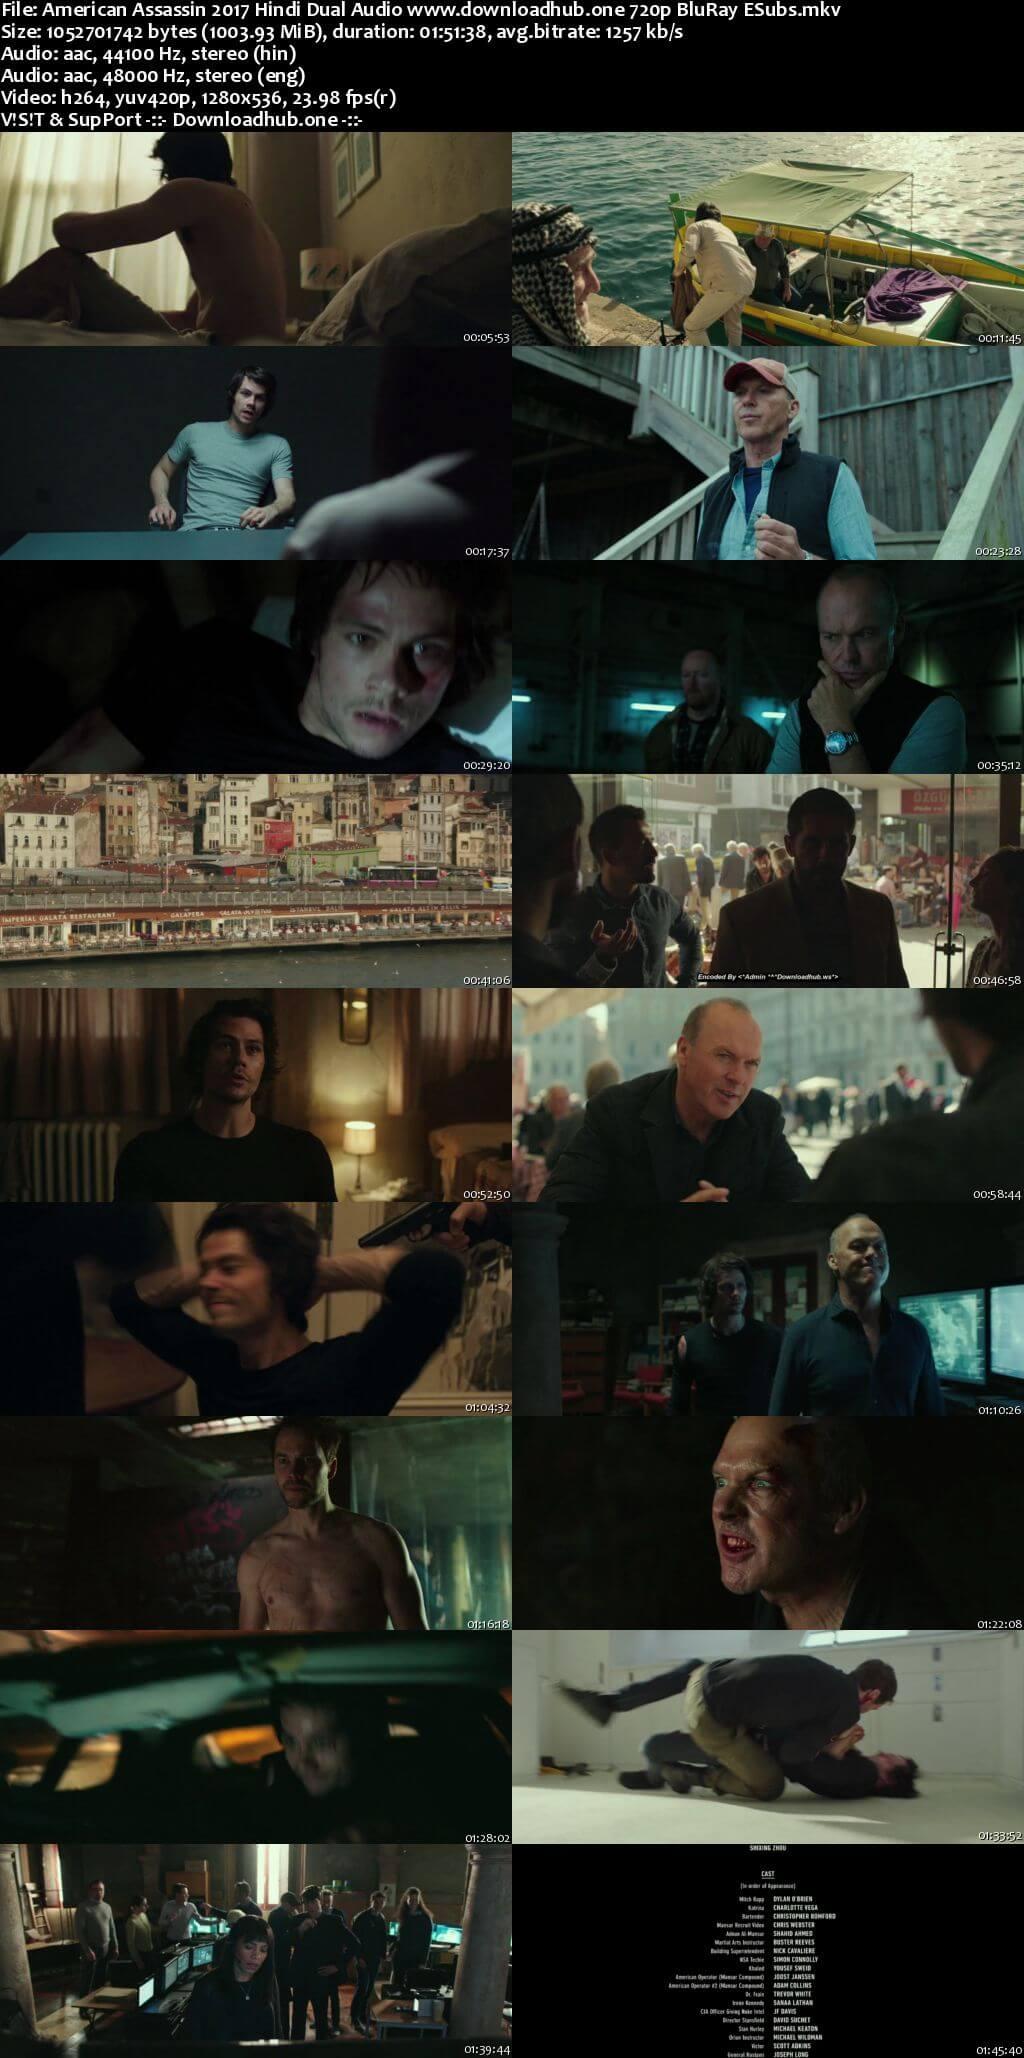 Download American Assassin 2017 Hindi Dual Audio Movie 720p BluRay ESubs